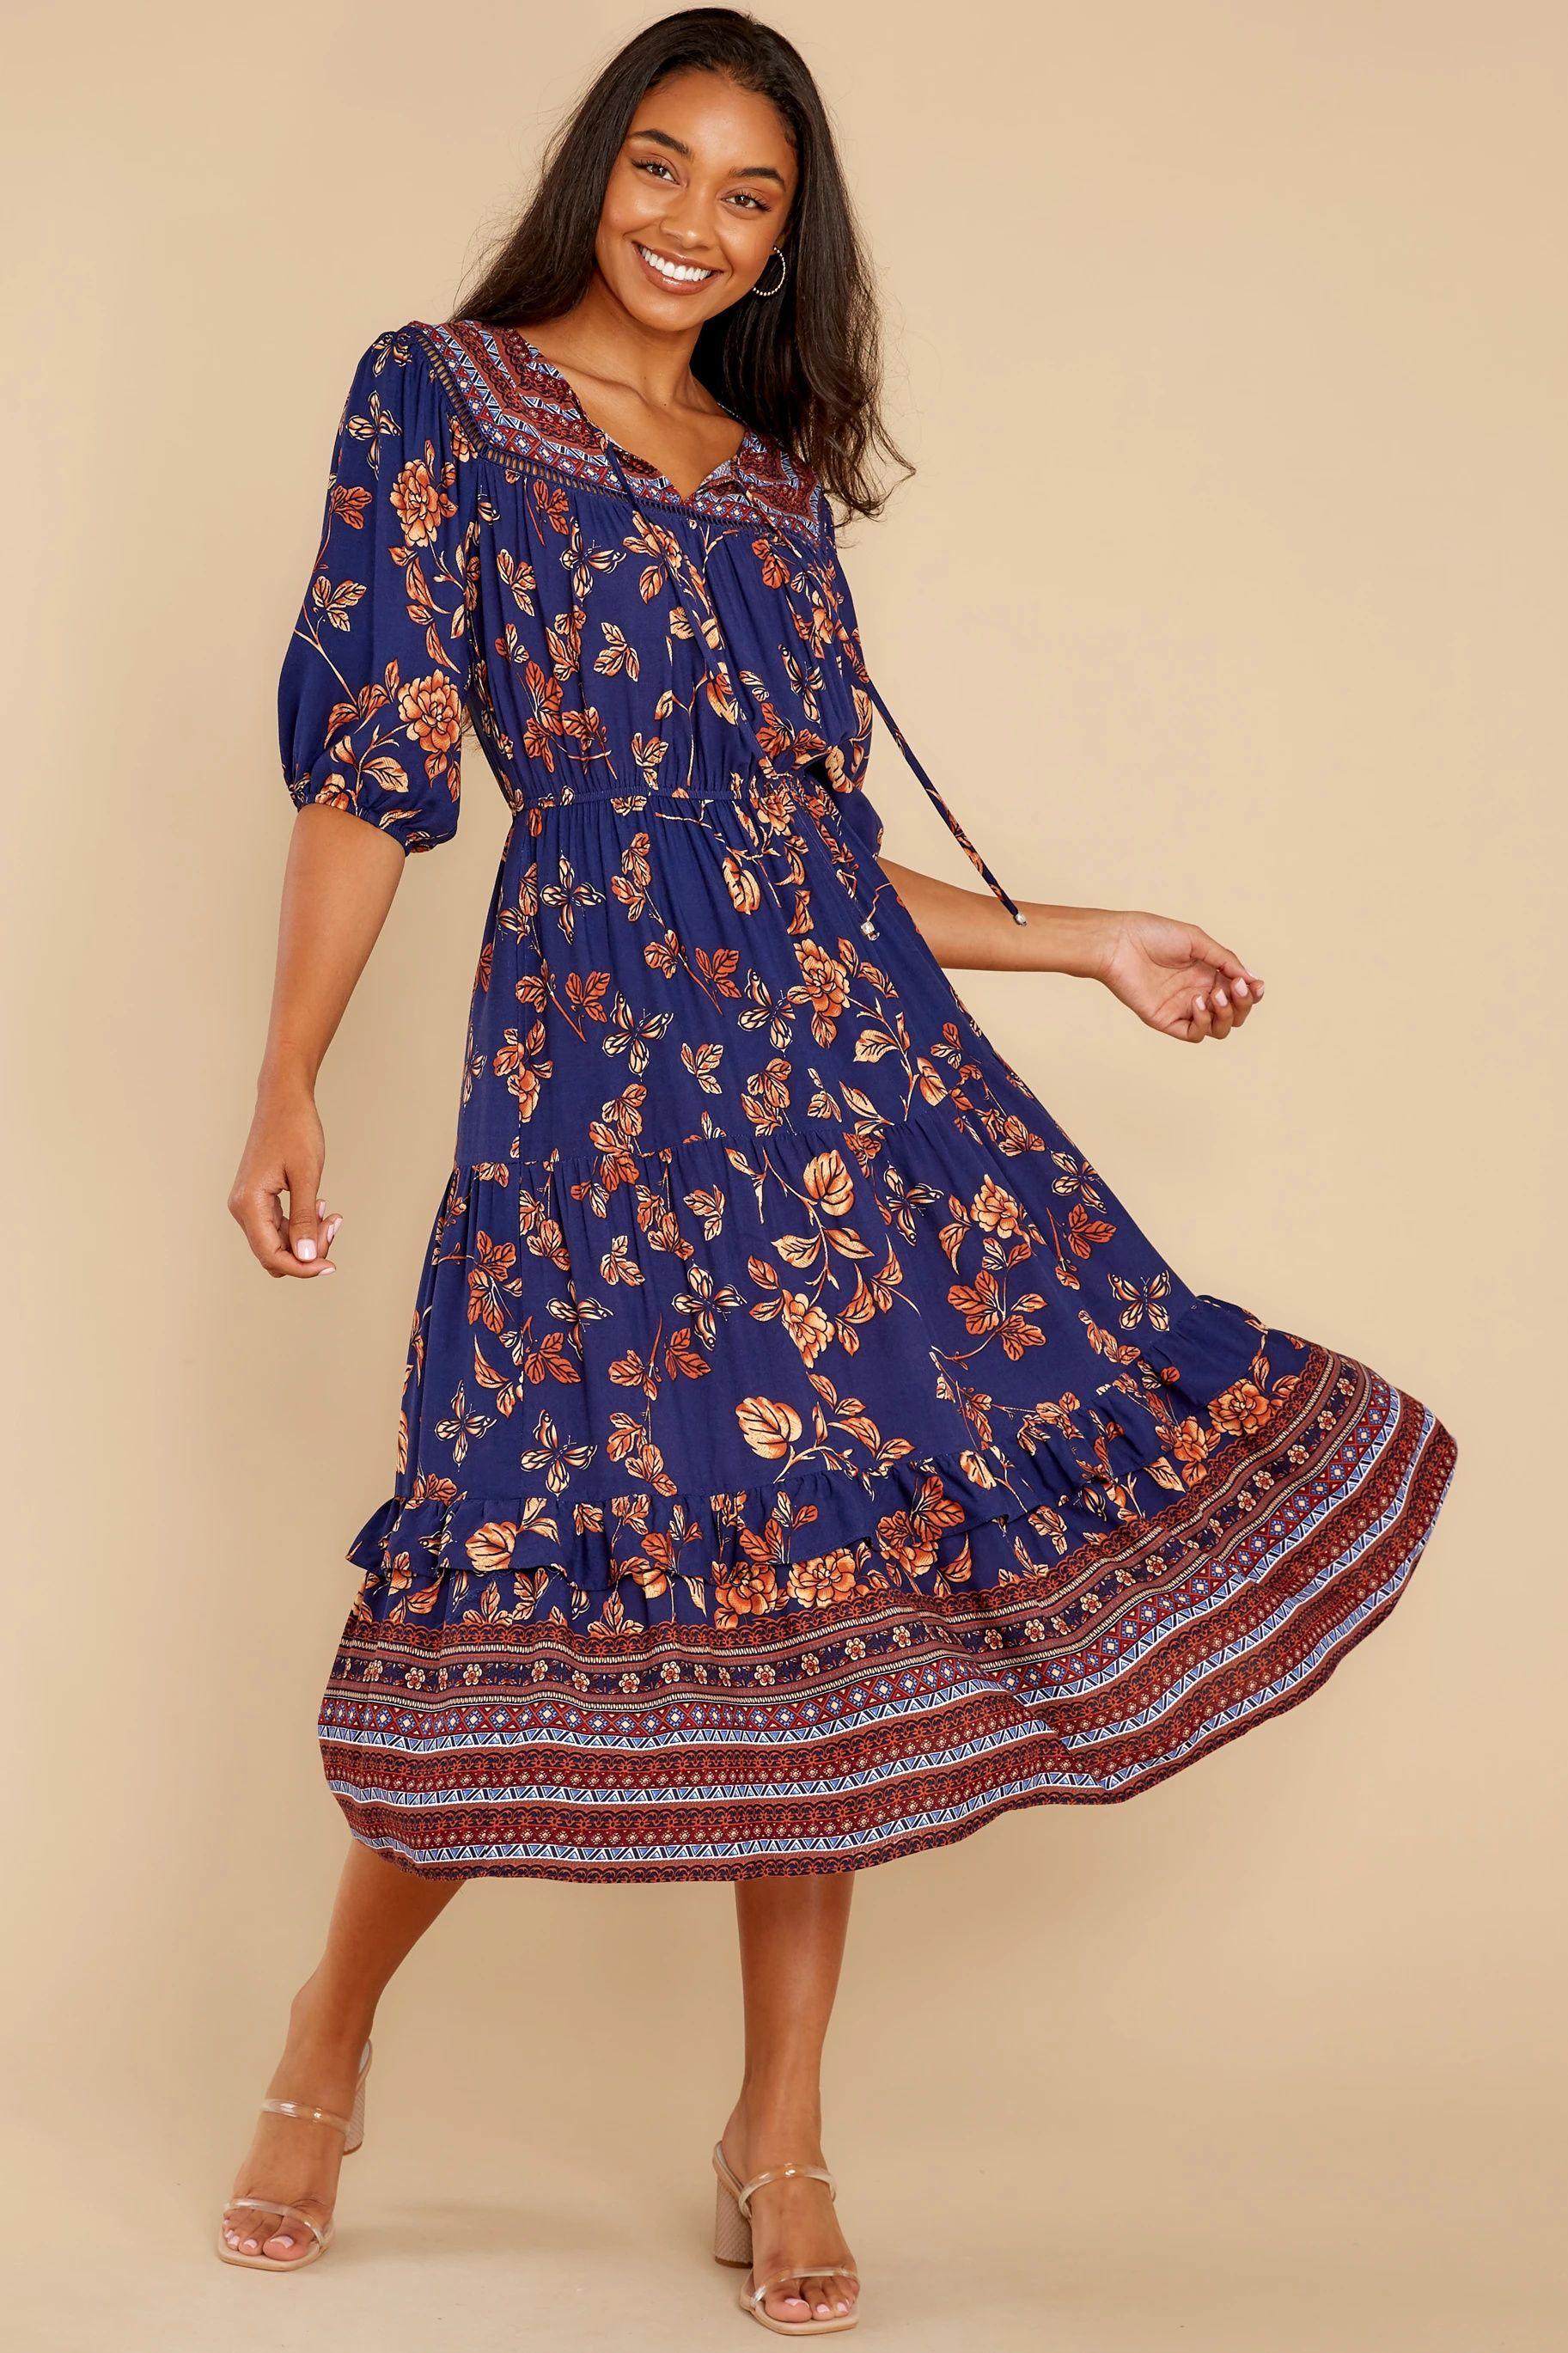 70s Dresses Boho Disco Dress 70s Dress Disco Dresses [ 2738 x 1825 Pixel ]